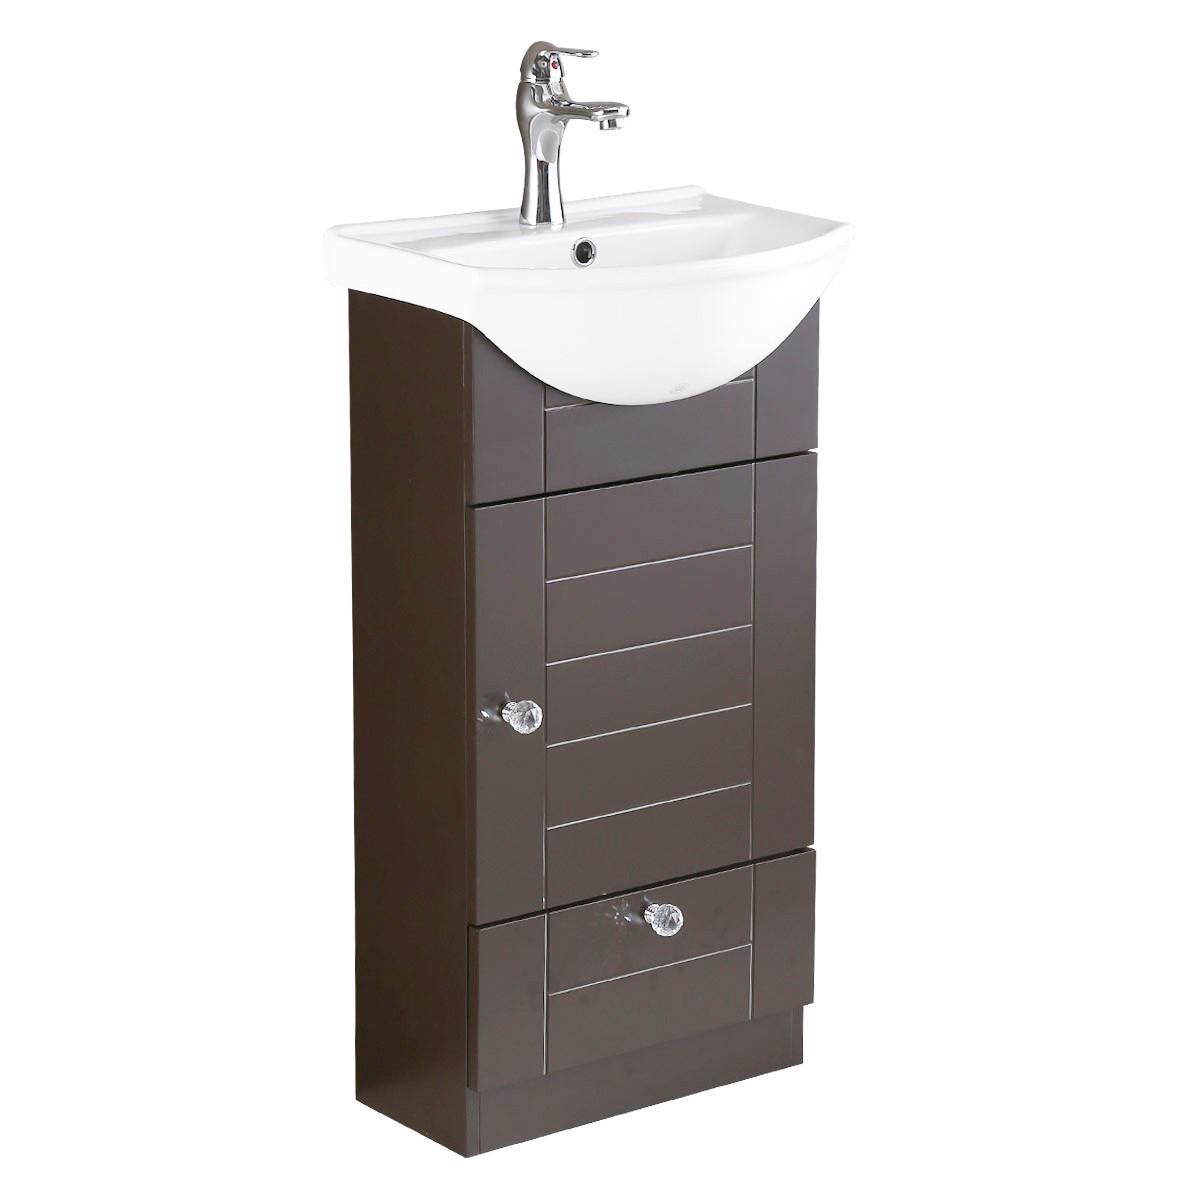 Wall Mounted Bathroom Vanity Cabinet Sink Dark Oak throughout size 1200 X 1200